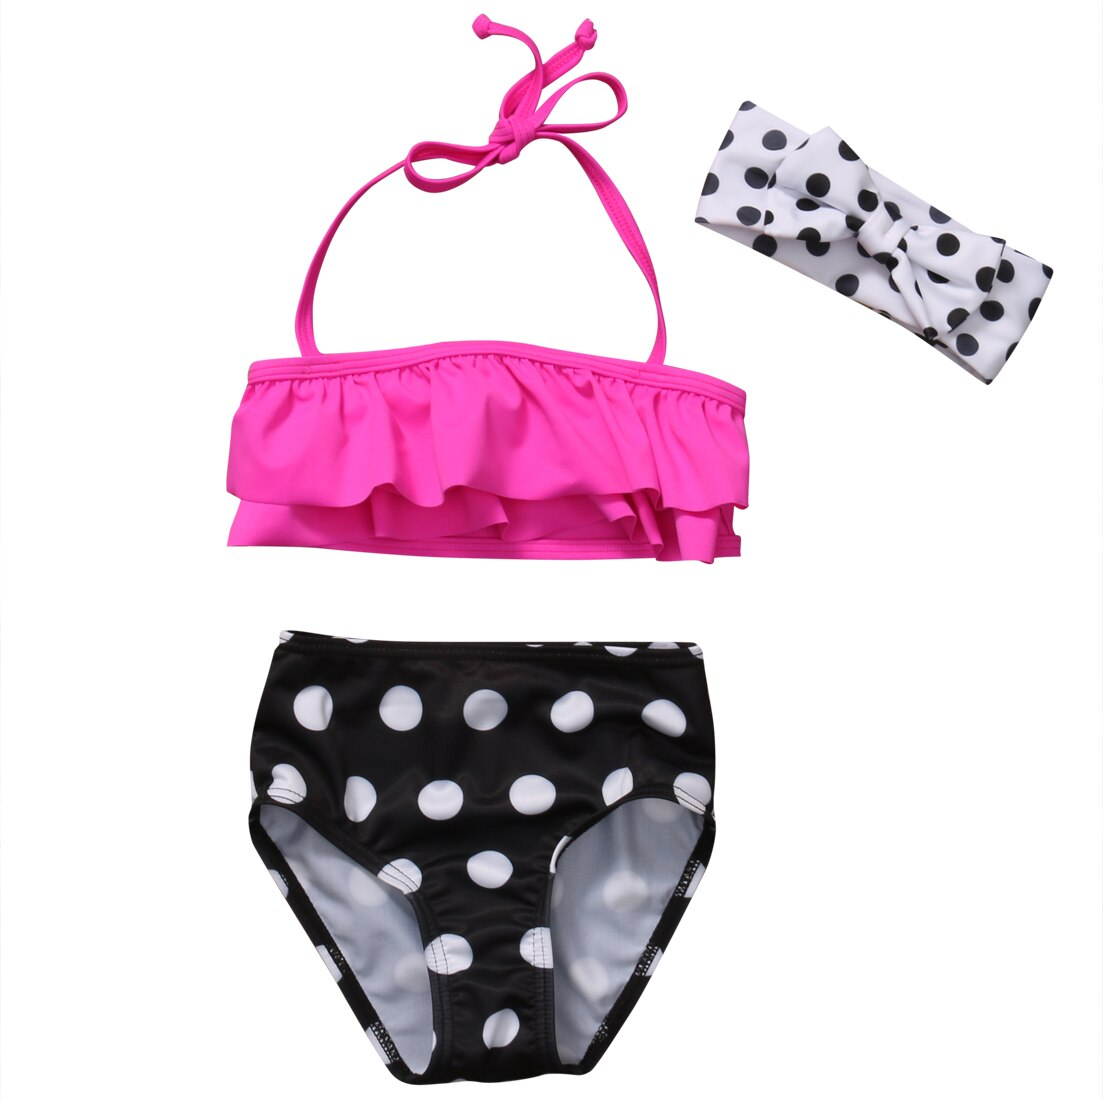 1-6Y New Summer Cute Toddler Kids Baby Girls Polka Dot Swimsuit Swimwear Bathing Suit Tankini Bikini Set